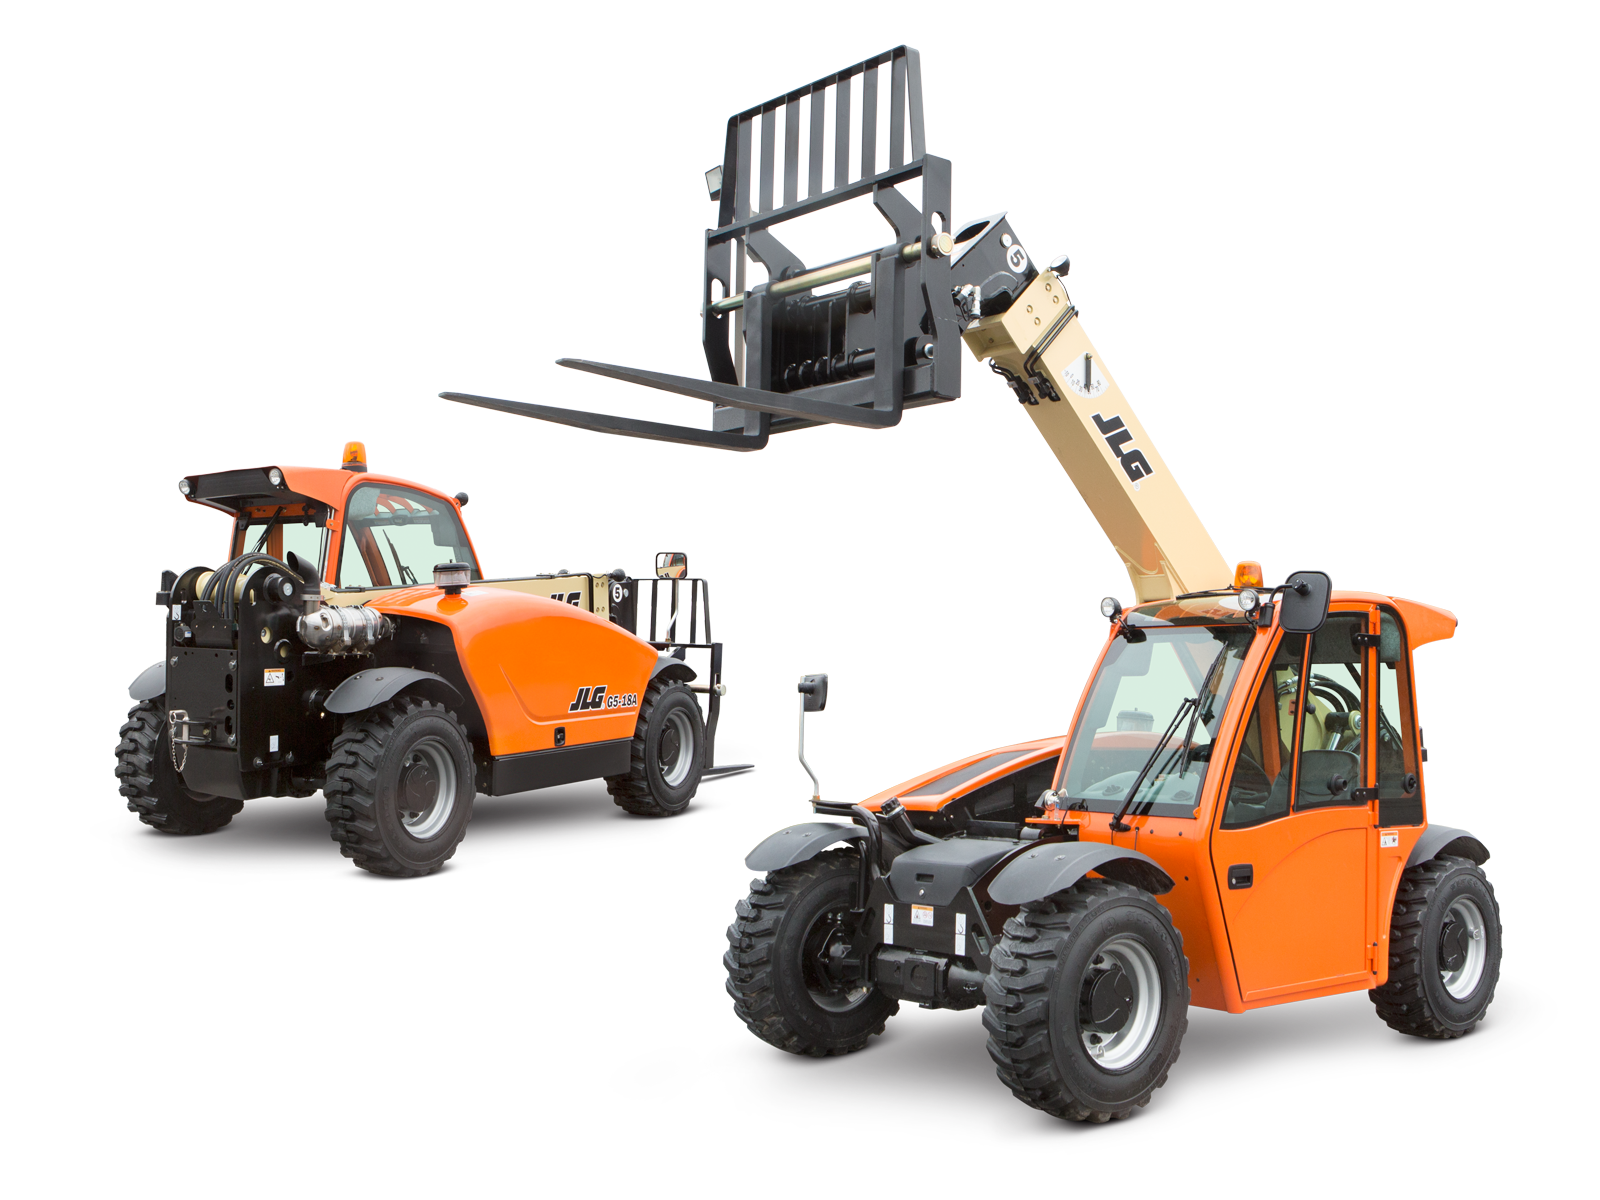 JLG® G5-18A Telehandler | Compact For Tight Job Sites | JLG